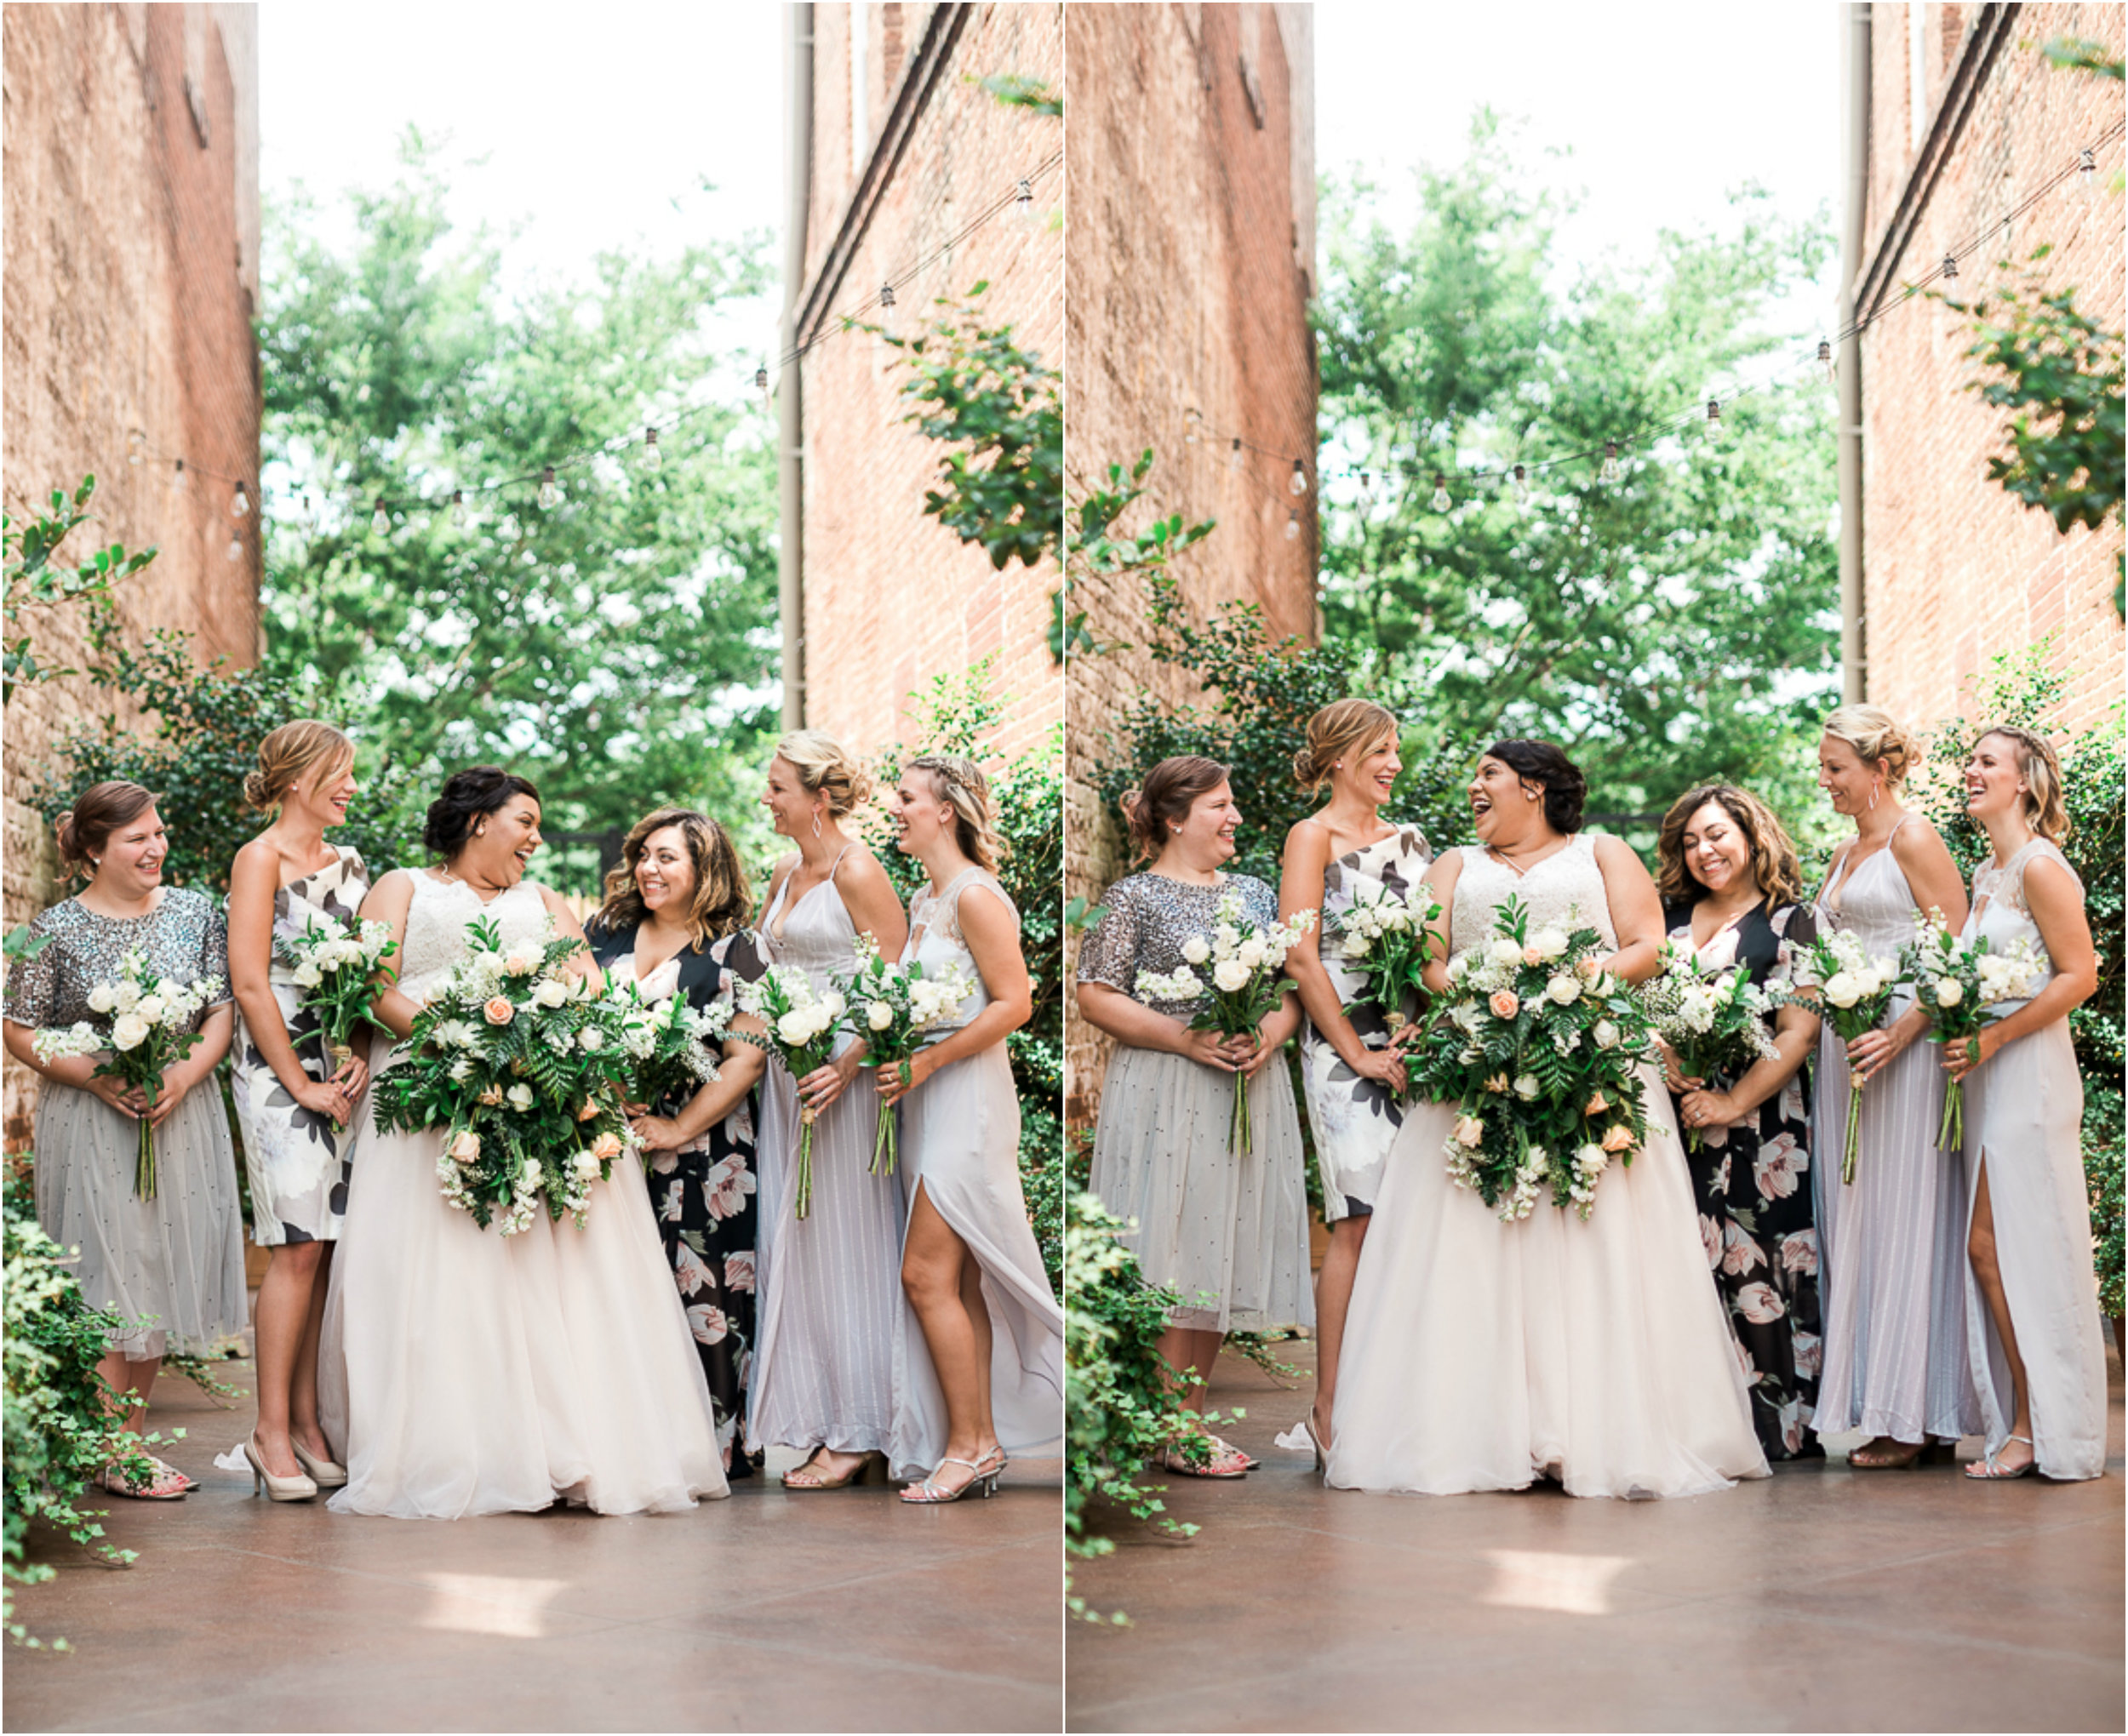 Floral Bridesmaid Dresses, Blush Wedding Gown 1.jpg